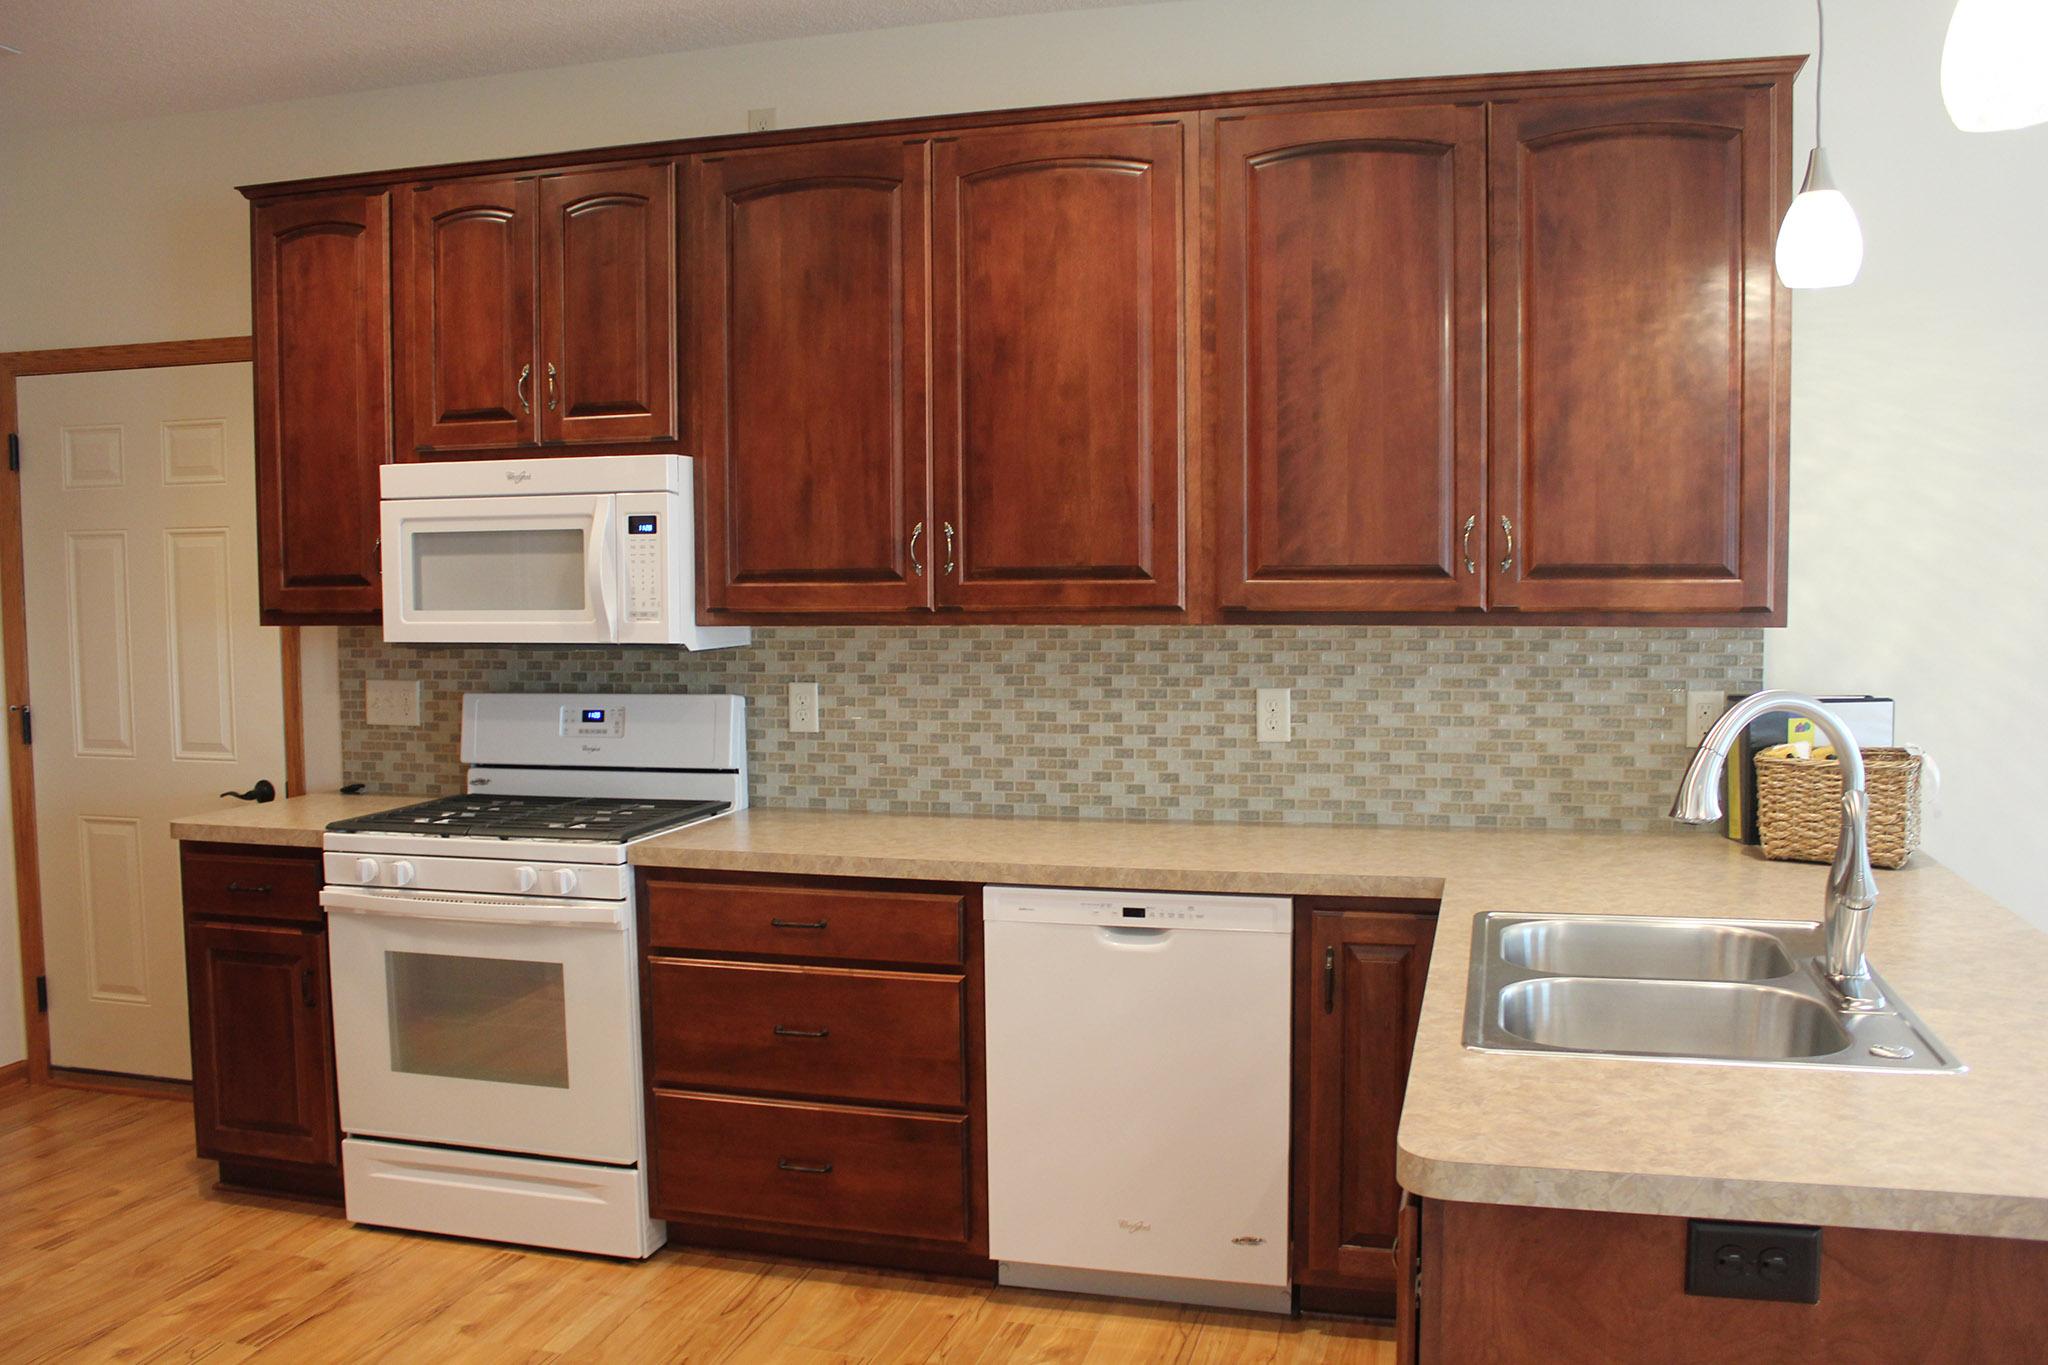 Kitchen with tile backsplash and white appliances